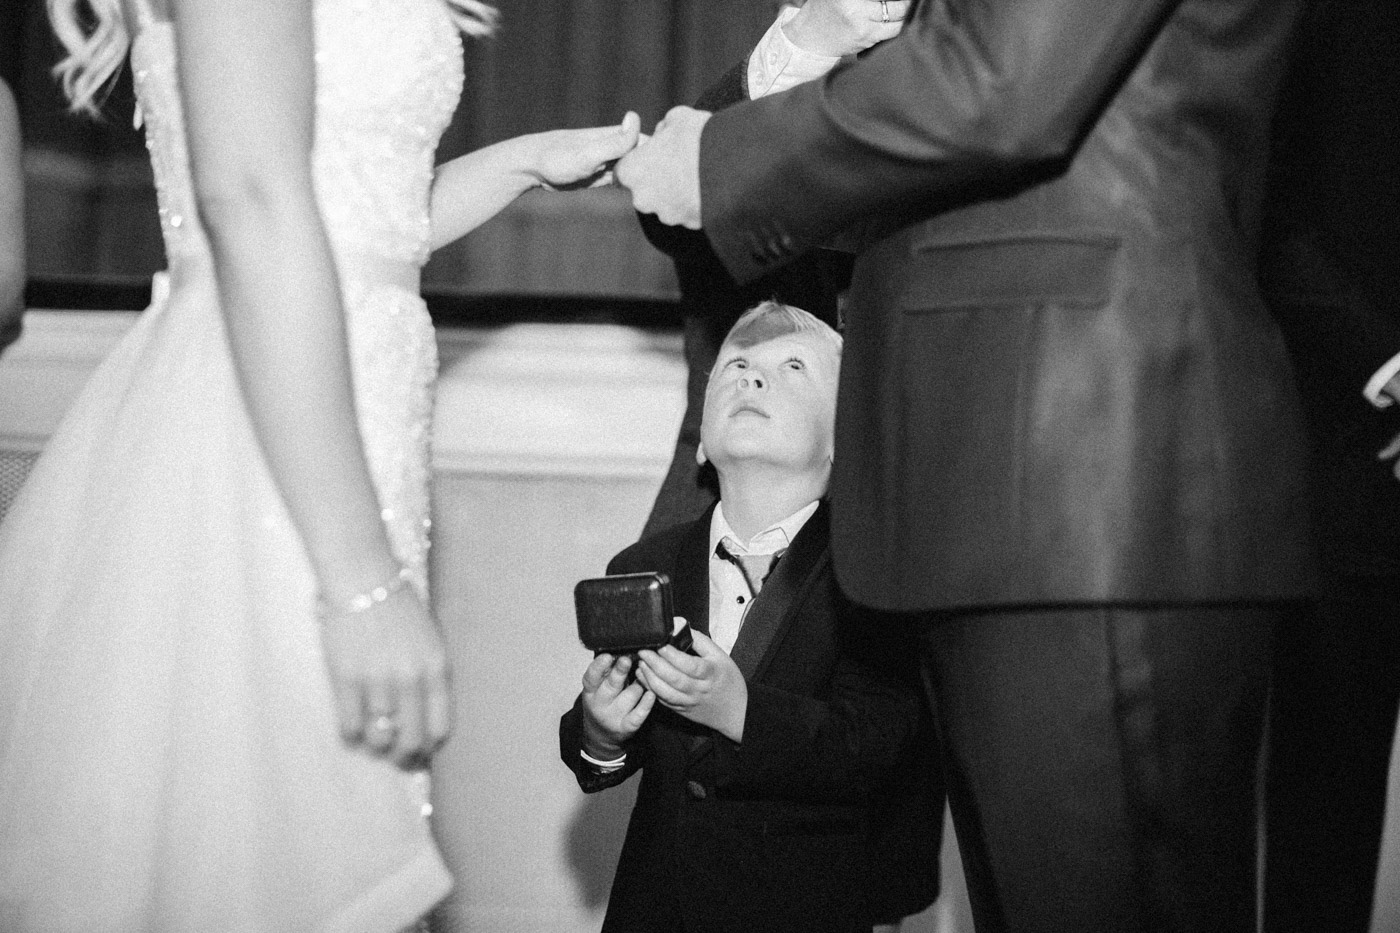 toronto_wedding_photographer_capitol_theare-354.jpg